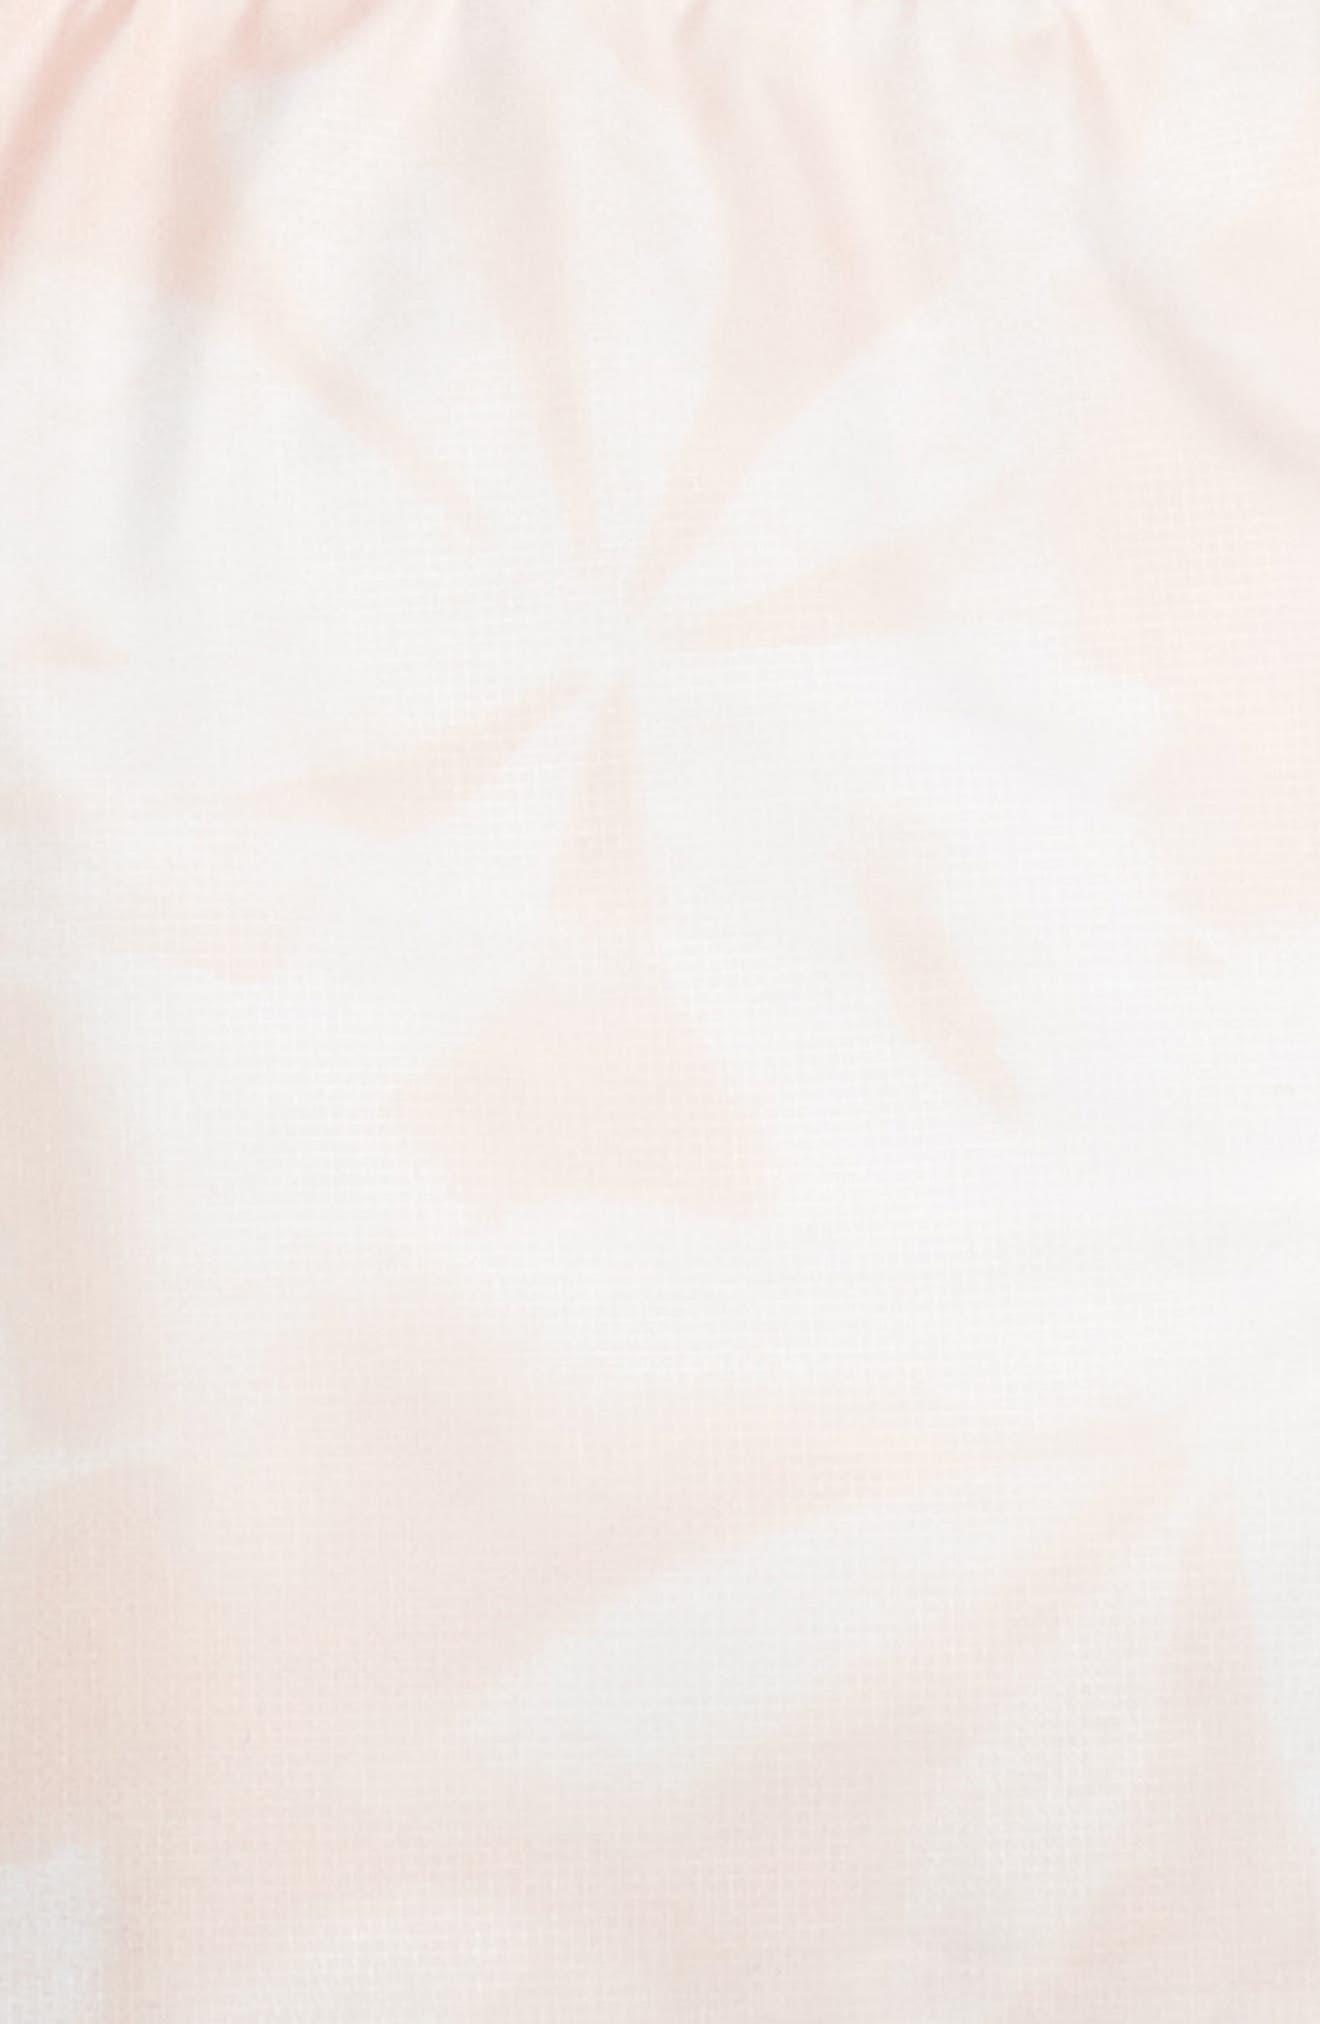 Fanorak Jacket,                             Alternate thumbnail 8, color,                             EVENING SAND LUPINE PRINT